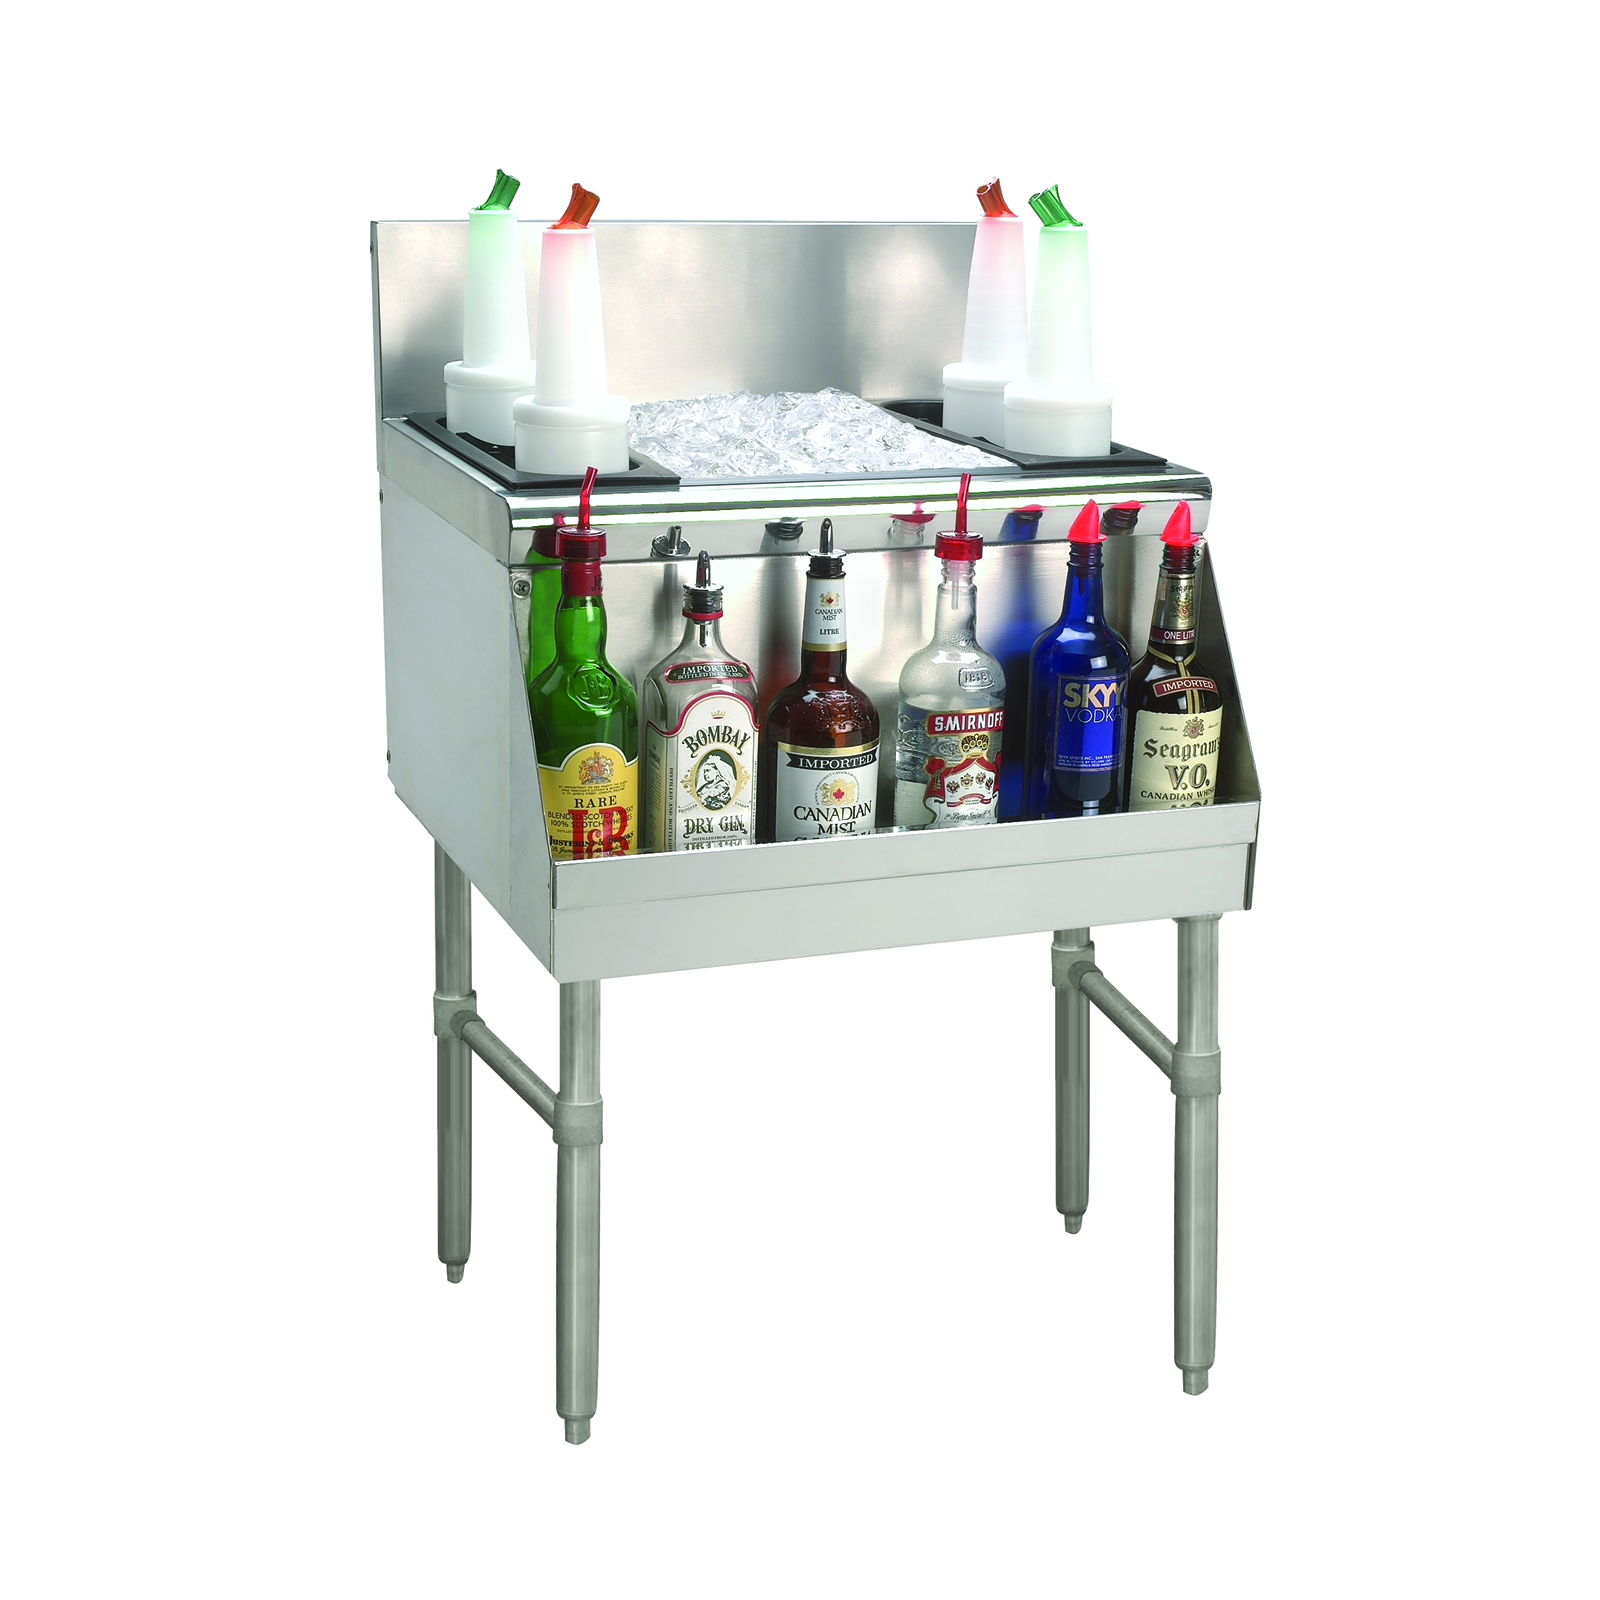 Advance Tabco PRI-24-30D underbar ice bin/cocktail unit